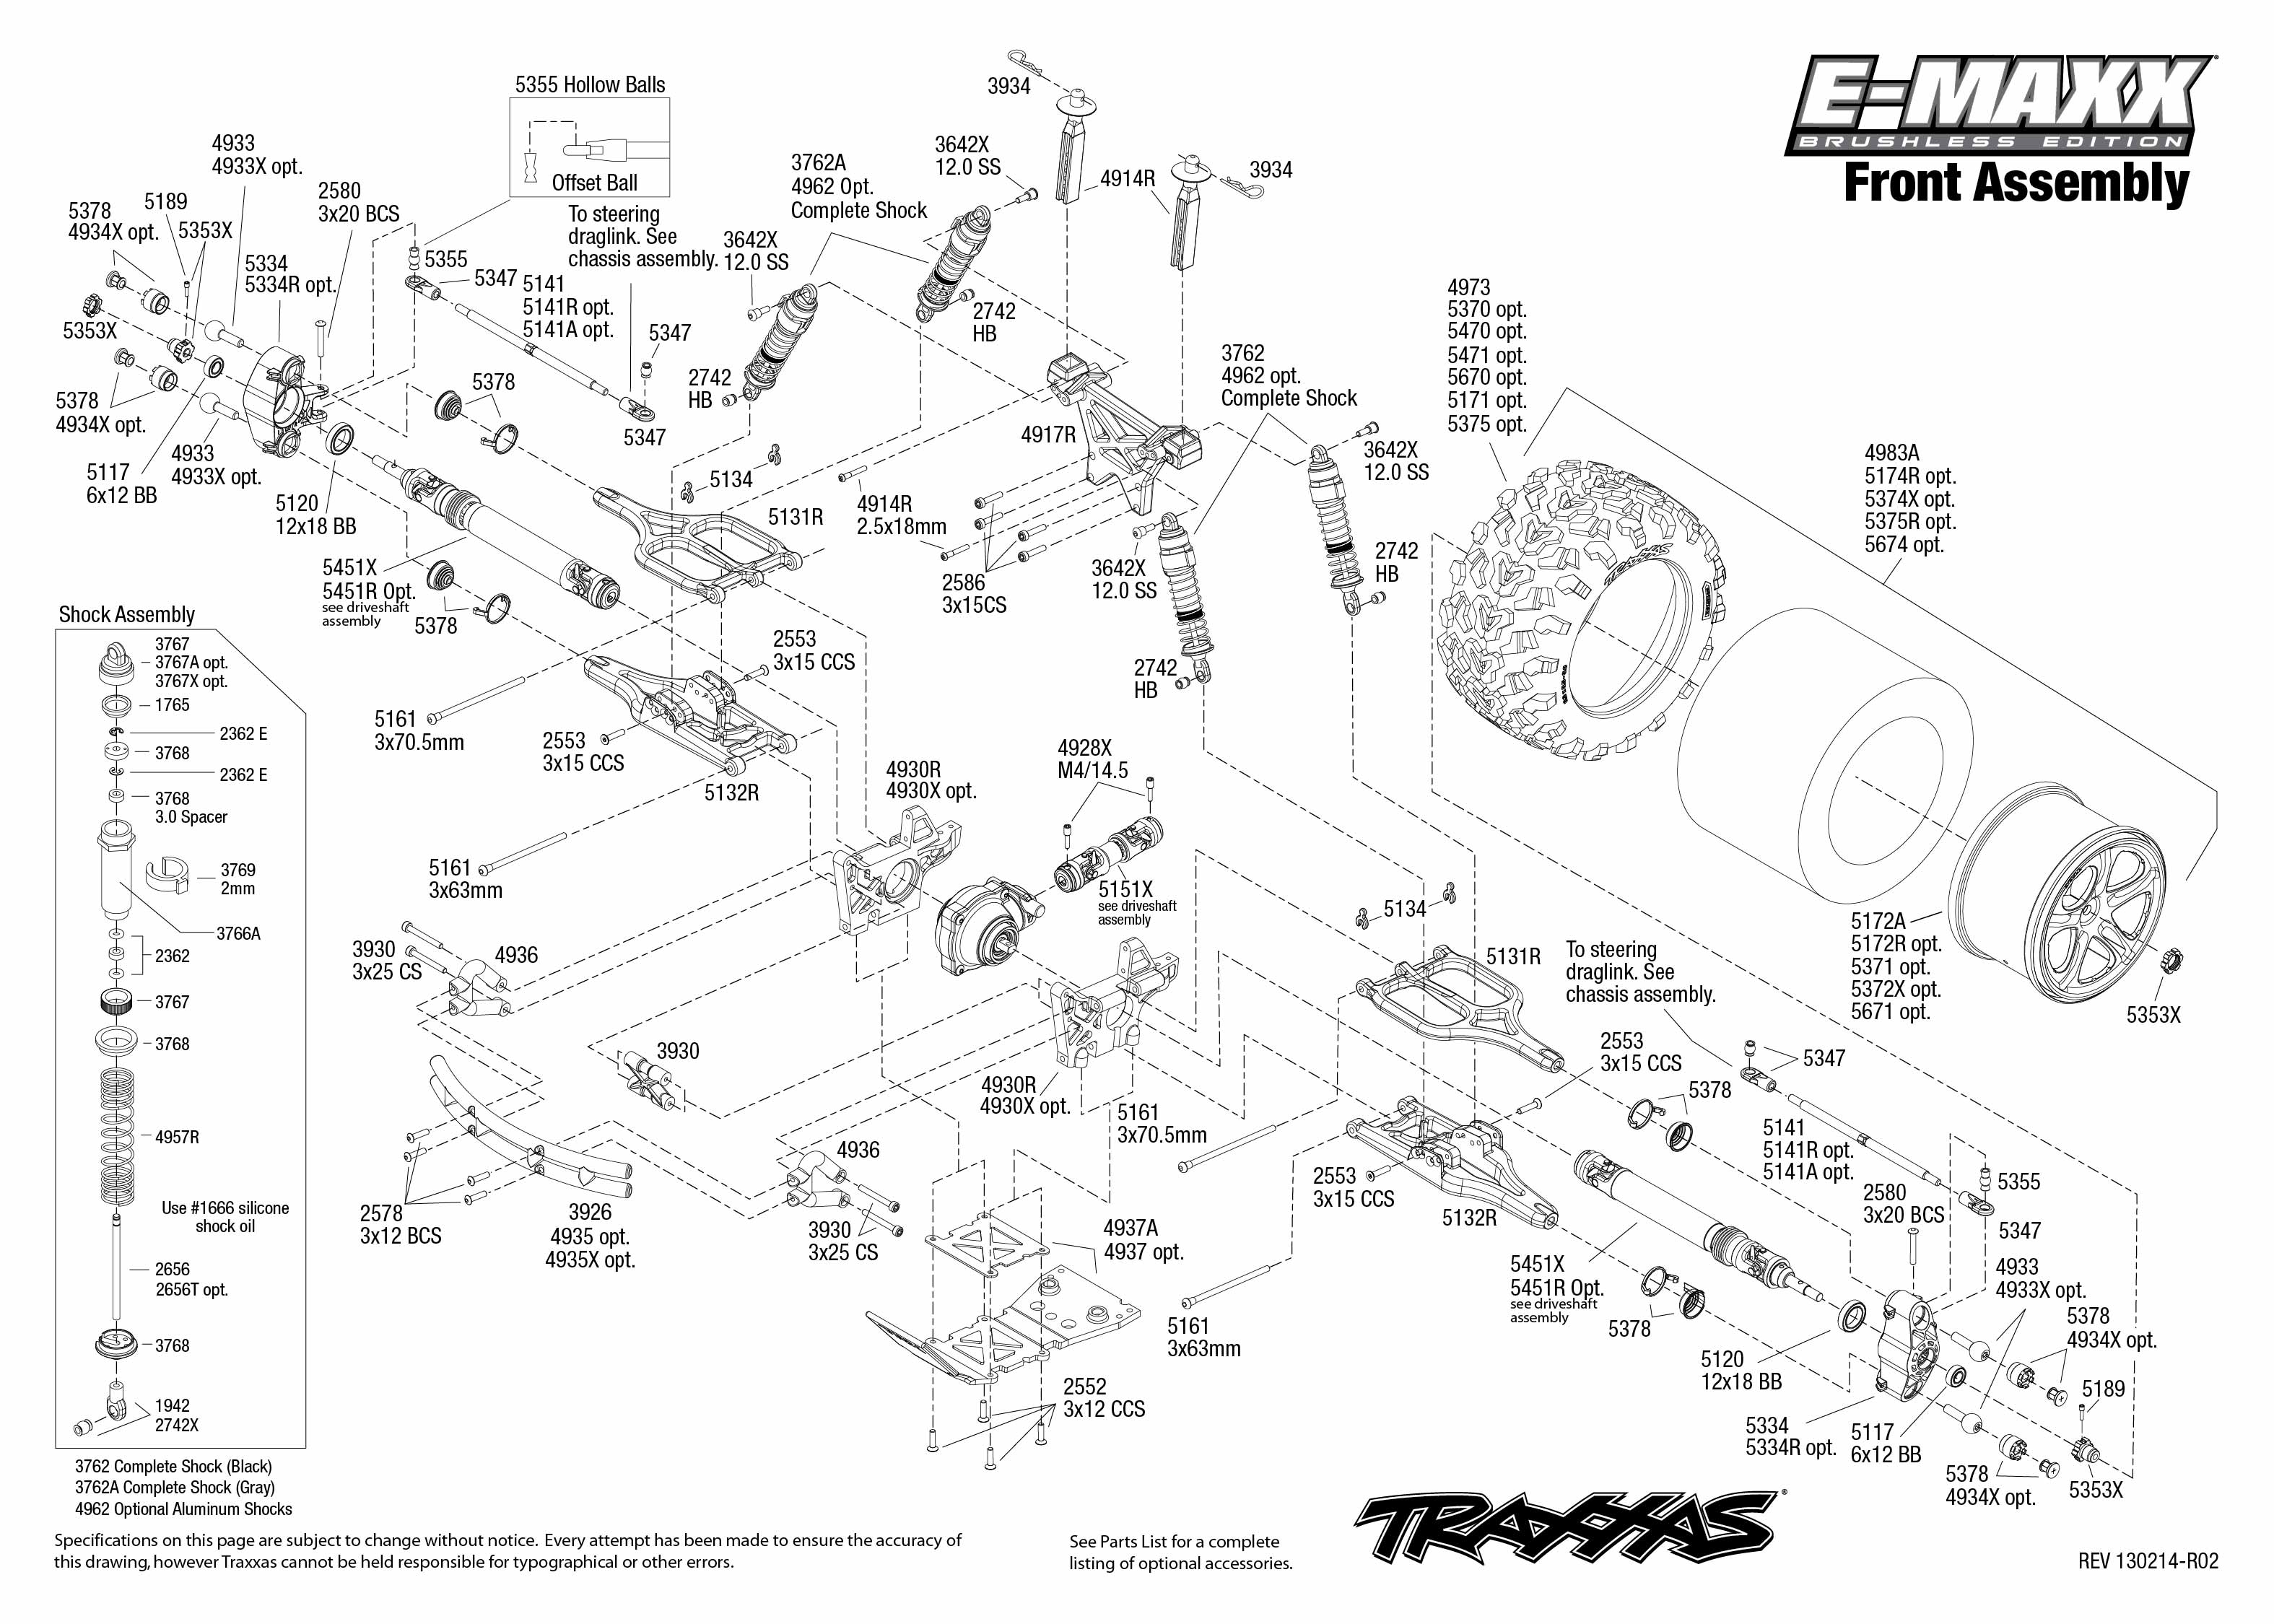 e maxx parts diagram wiring diagram online Traxxas E-Revo Colors 1 10 e maxx manual nitro e maxx parts diagram e maxx parts diagram